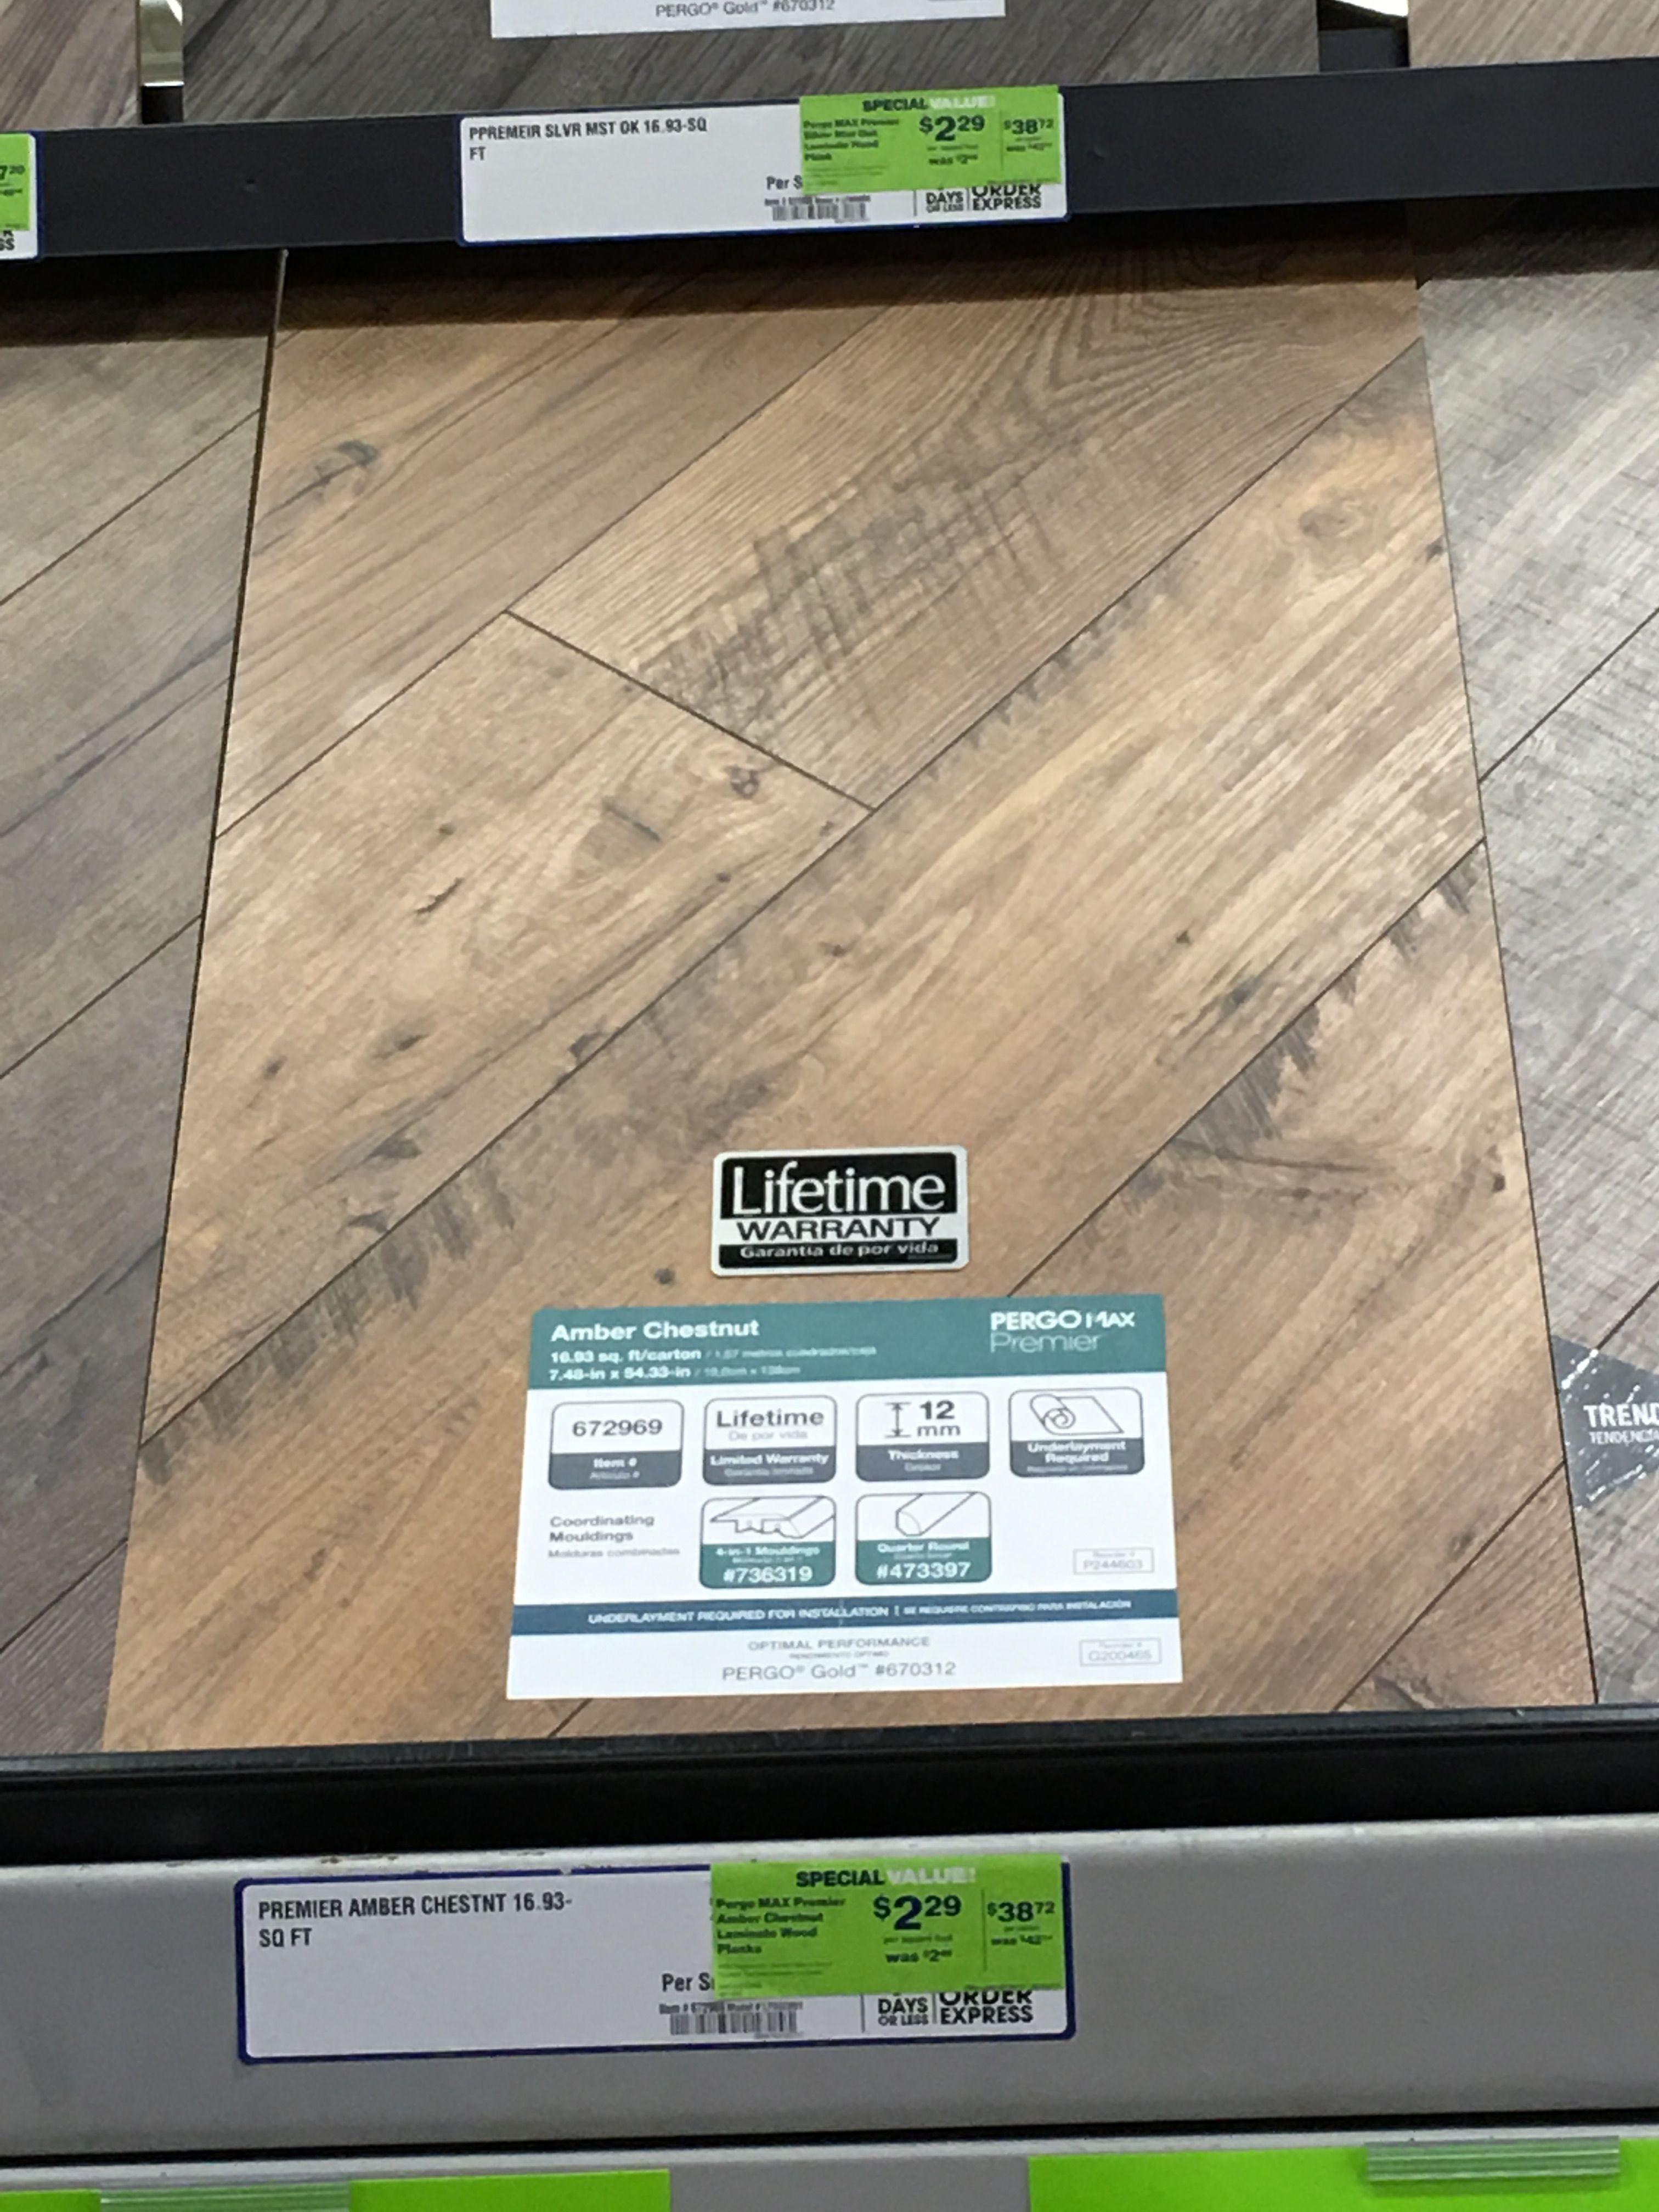 Lowe S Pergo Amber Chestnut Farmhouse, Pergo Amber Chestnut Laminate Flooring